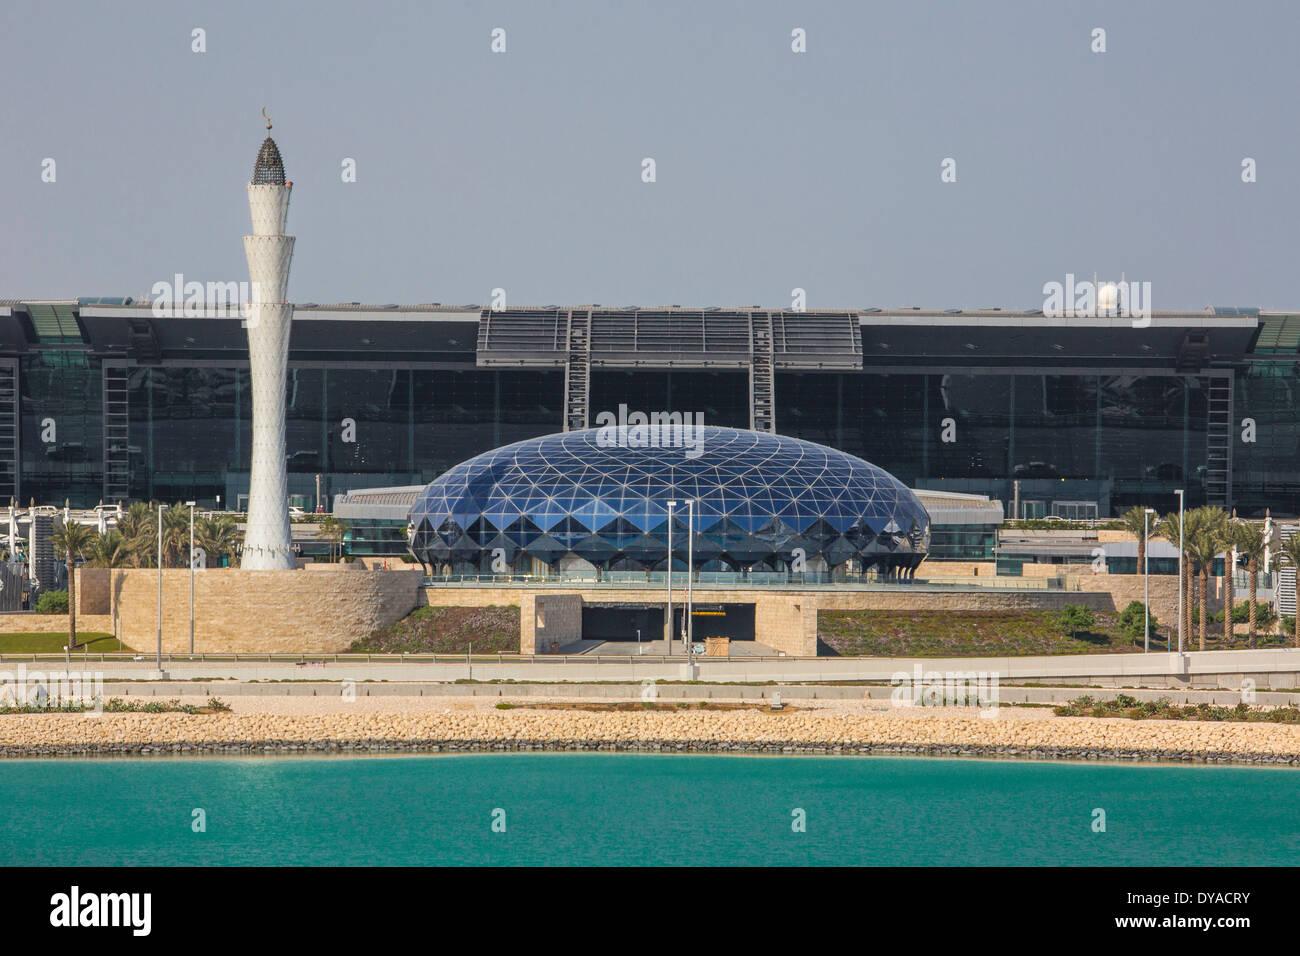 Doha, New Doha, Qatar, Middle East, airport, architecture, city, building, international, minaret, travel - Stock Image